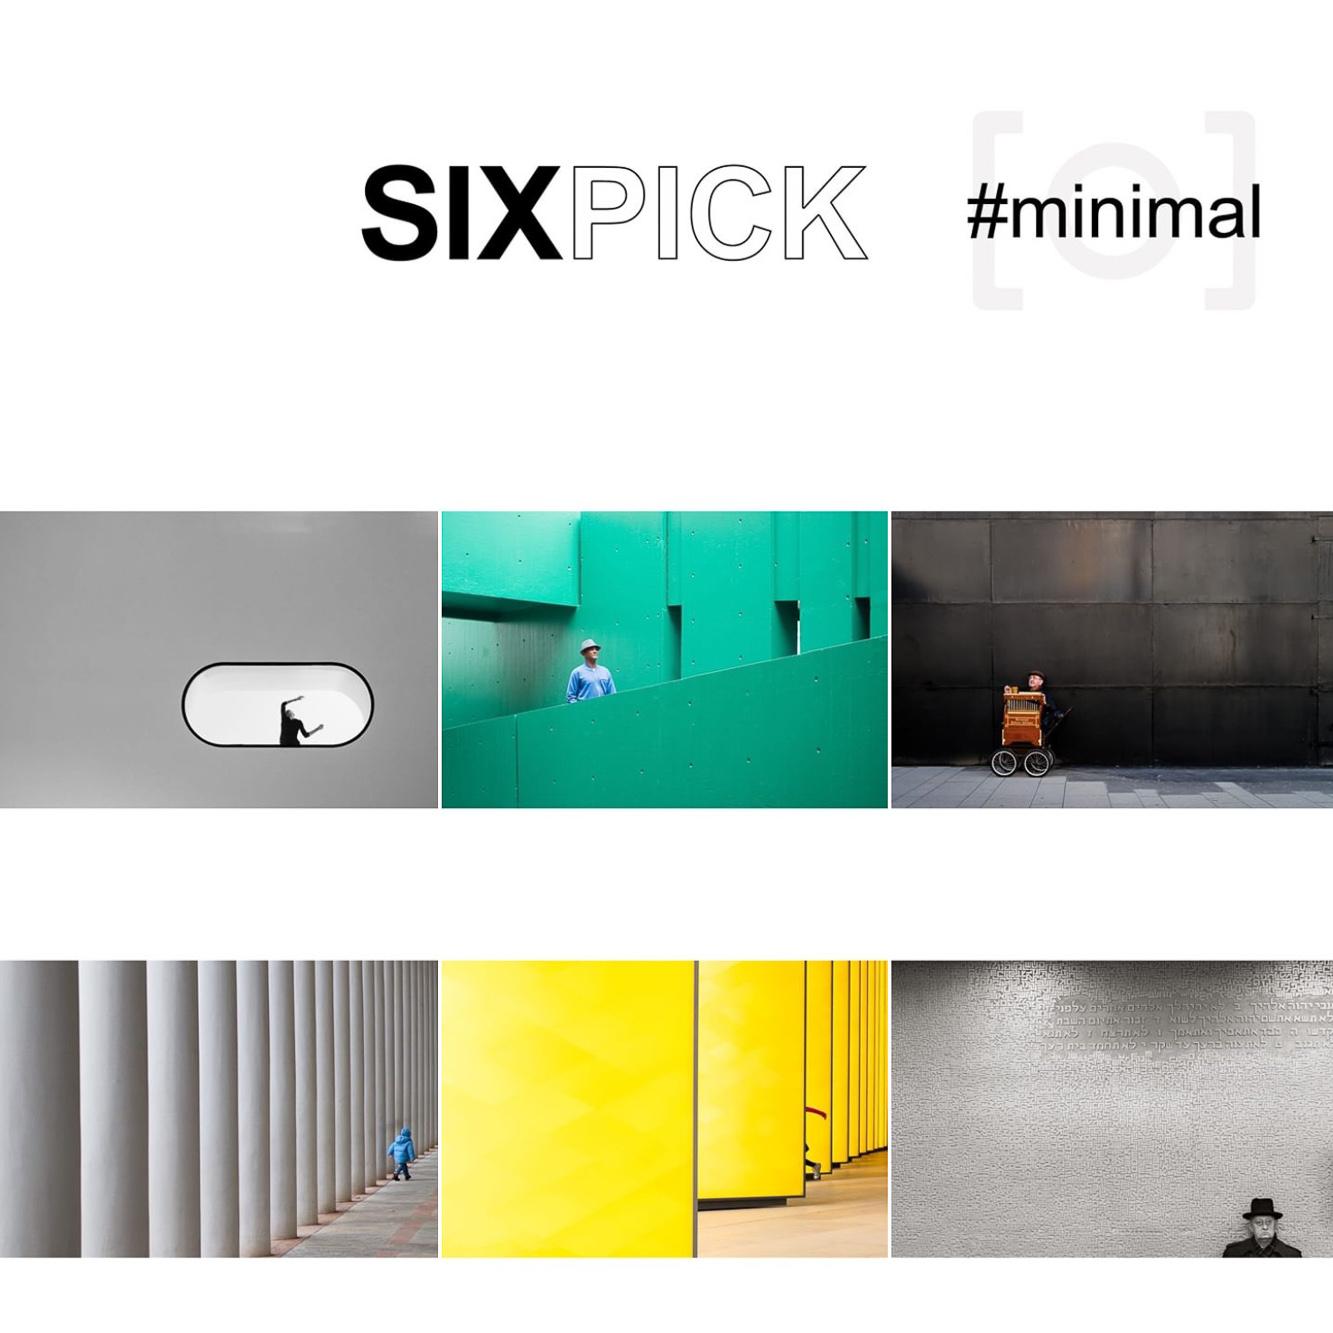 querformat-fotografie - Achim Katzberg - querformat-fotografie_Screenshot_minimal